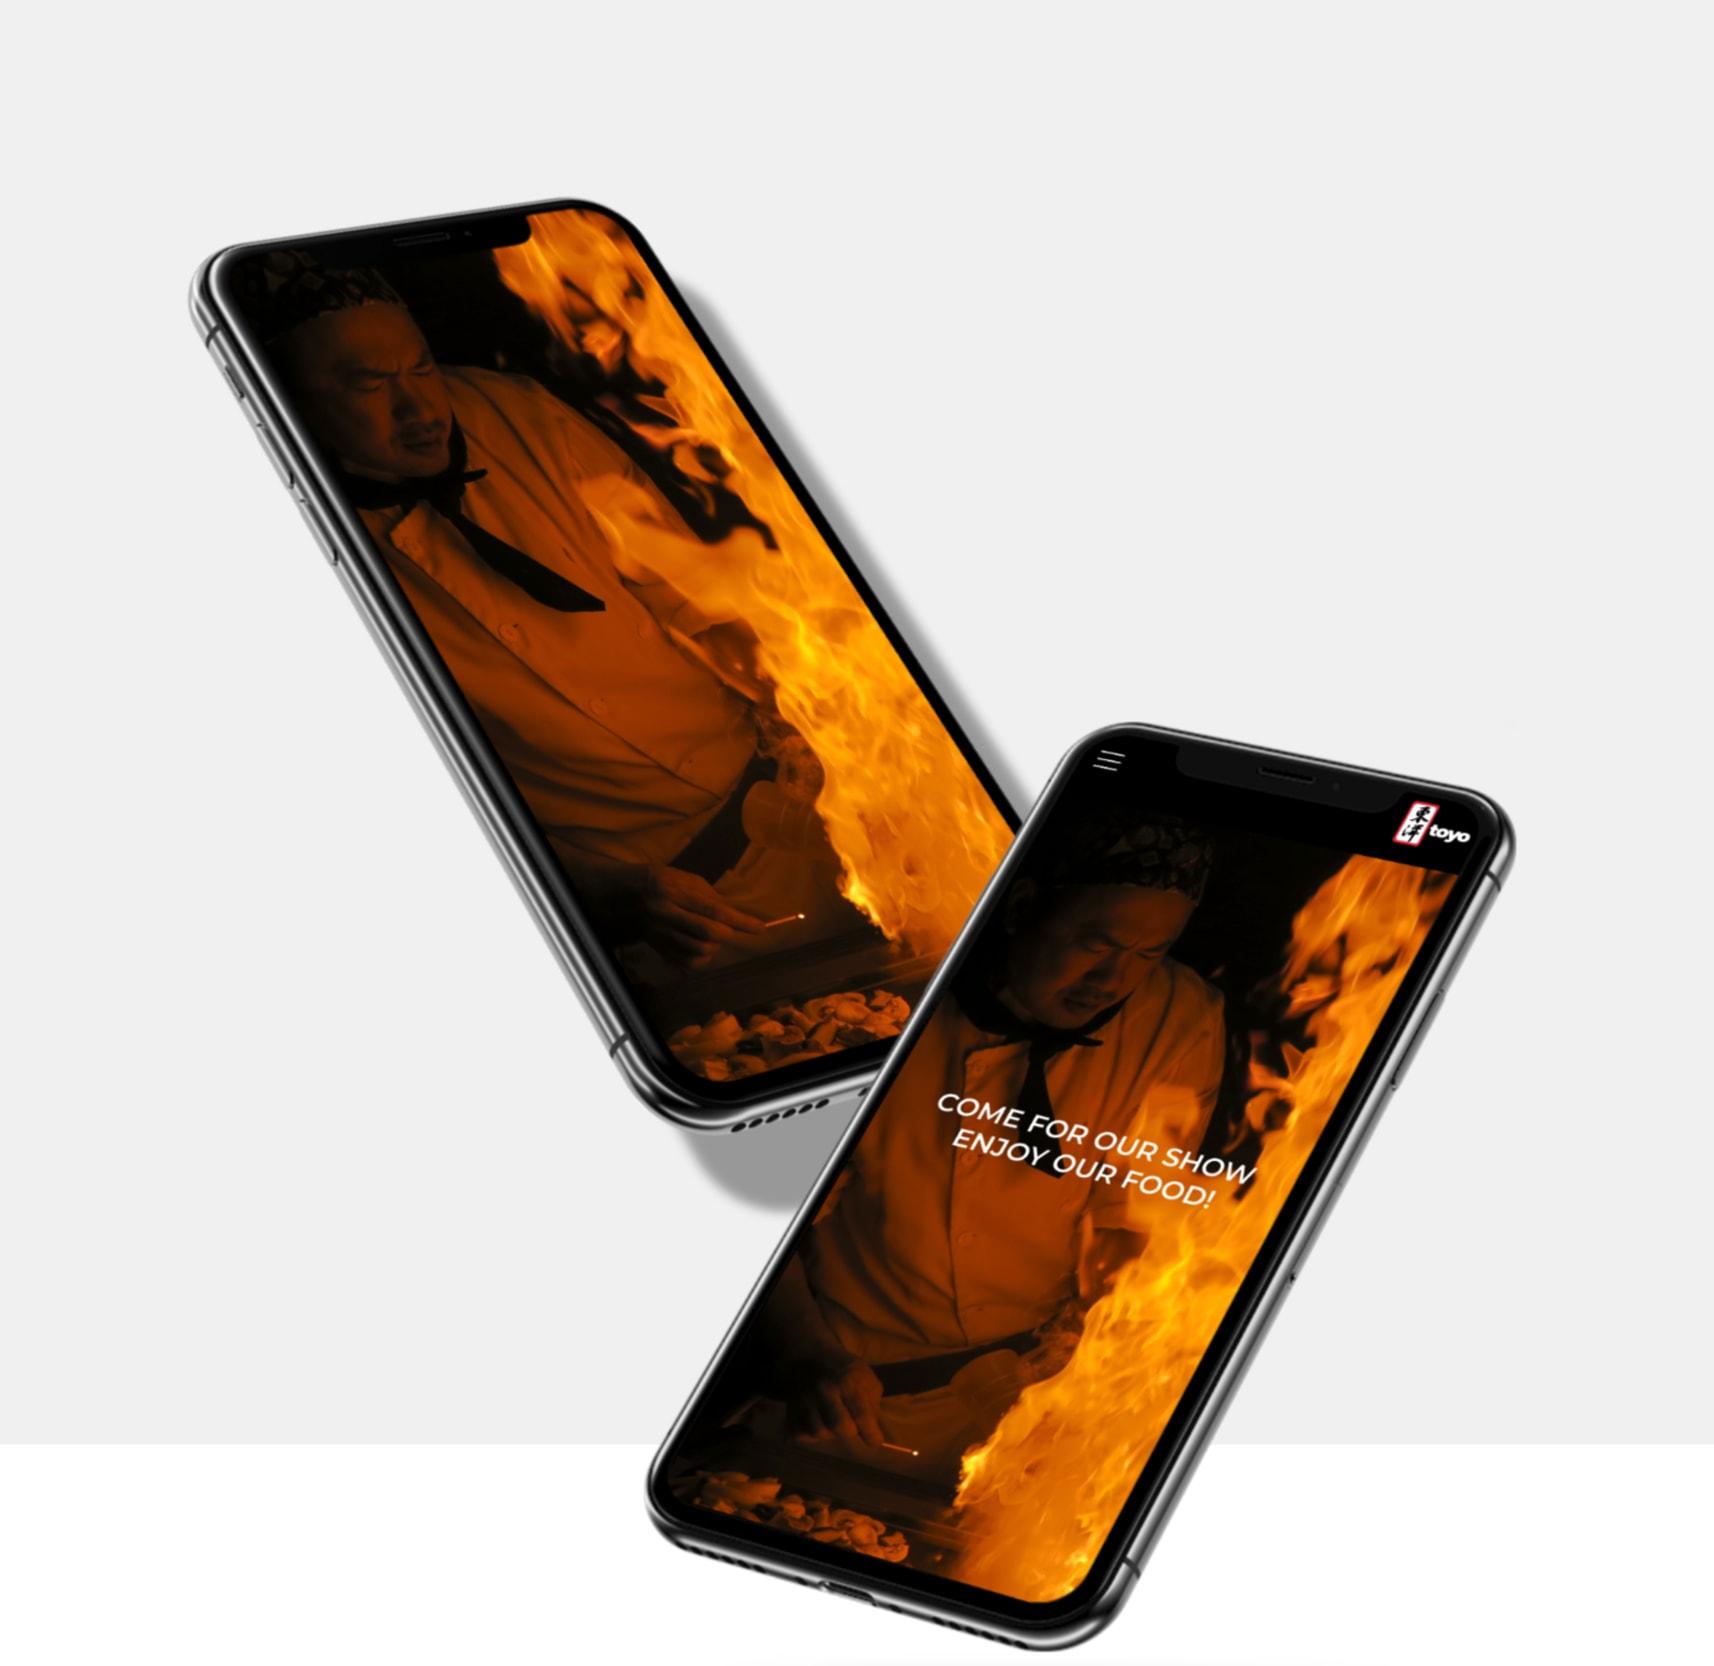 New site's iphone mockup